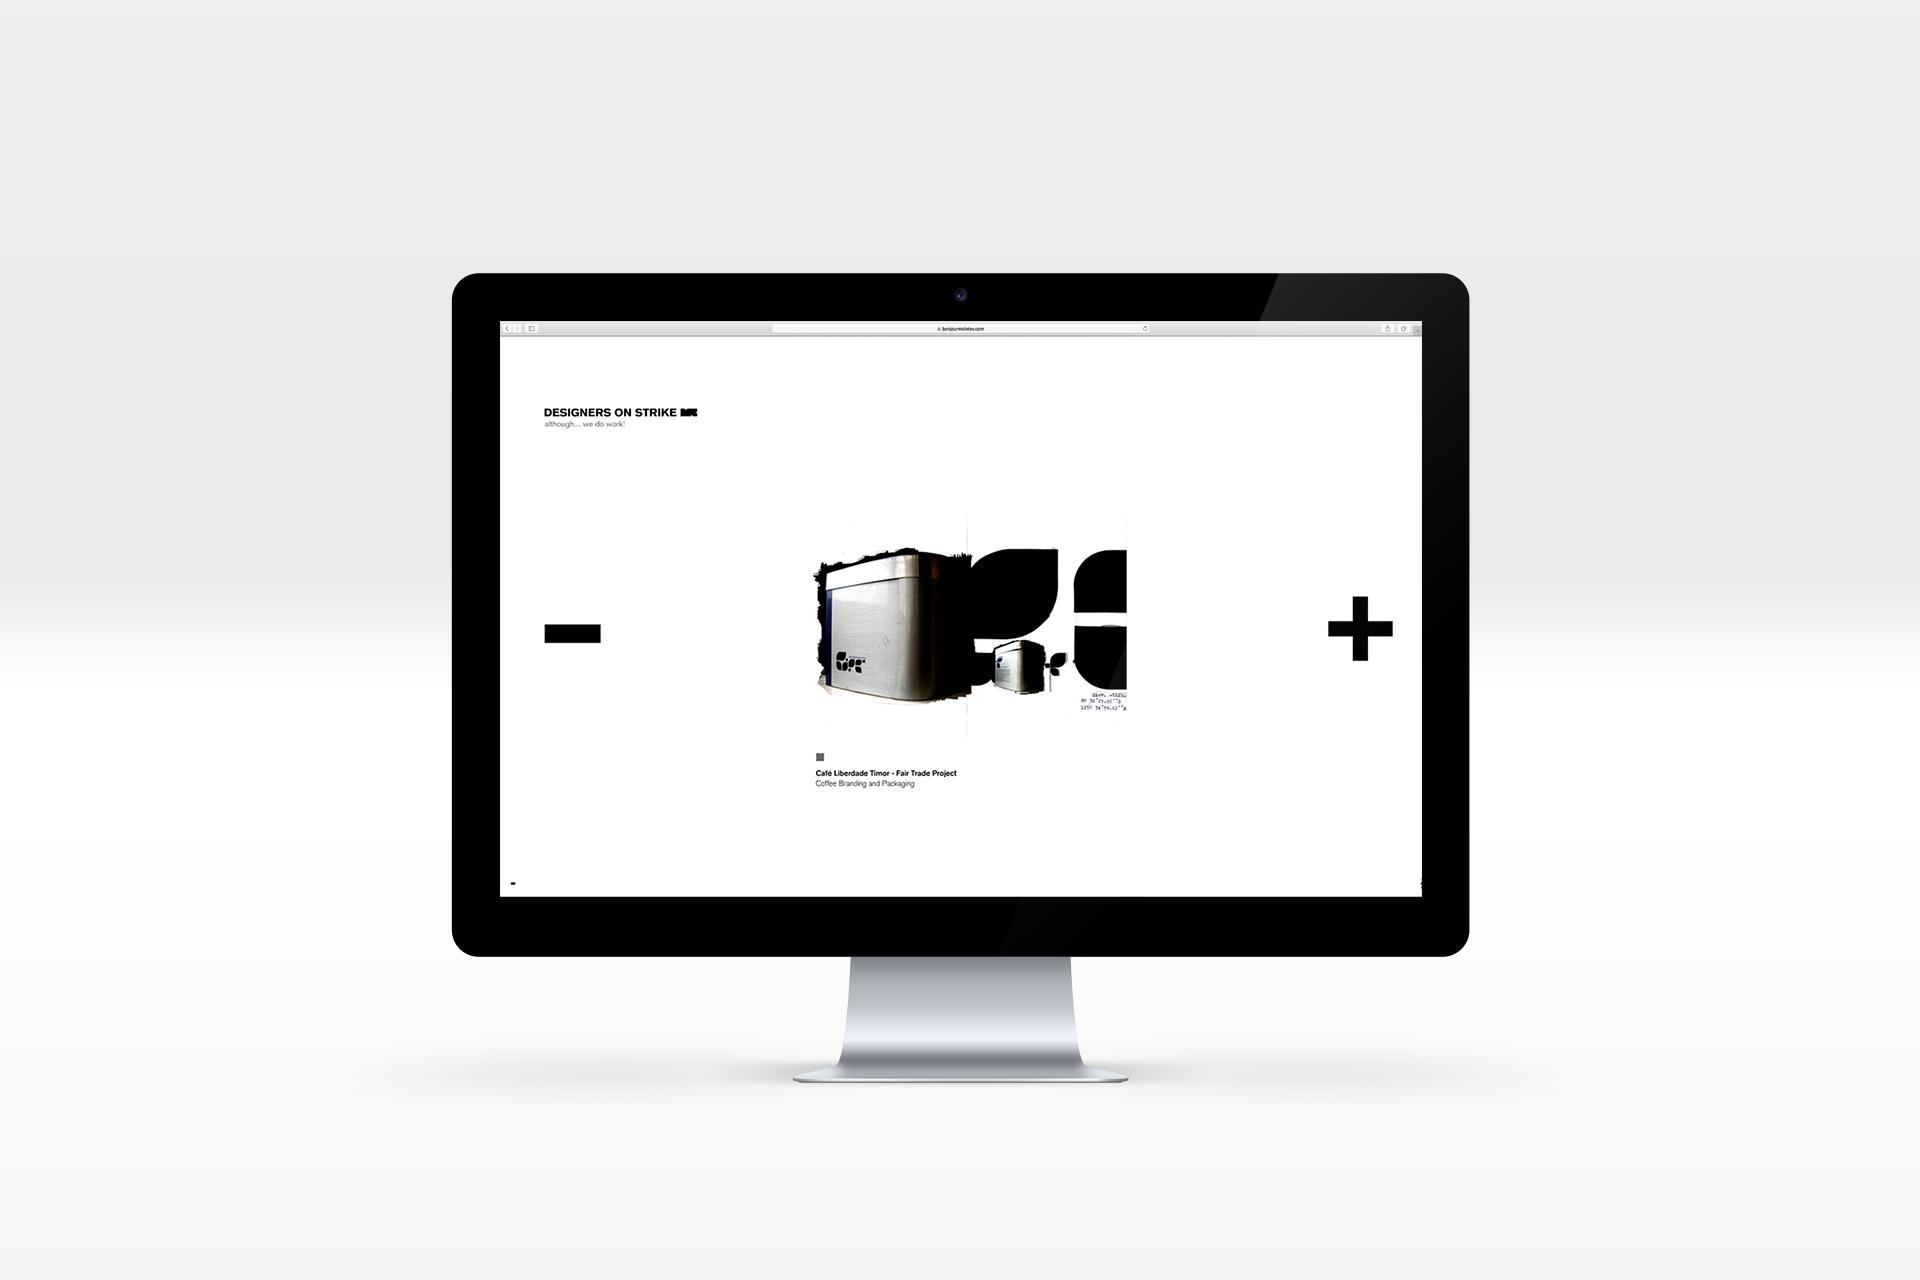 Design Web Design Designers on strike — bonjourmolotov